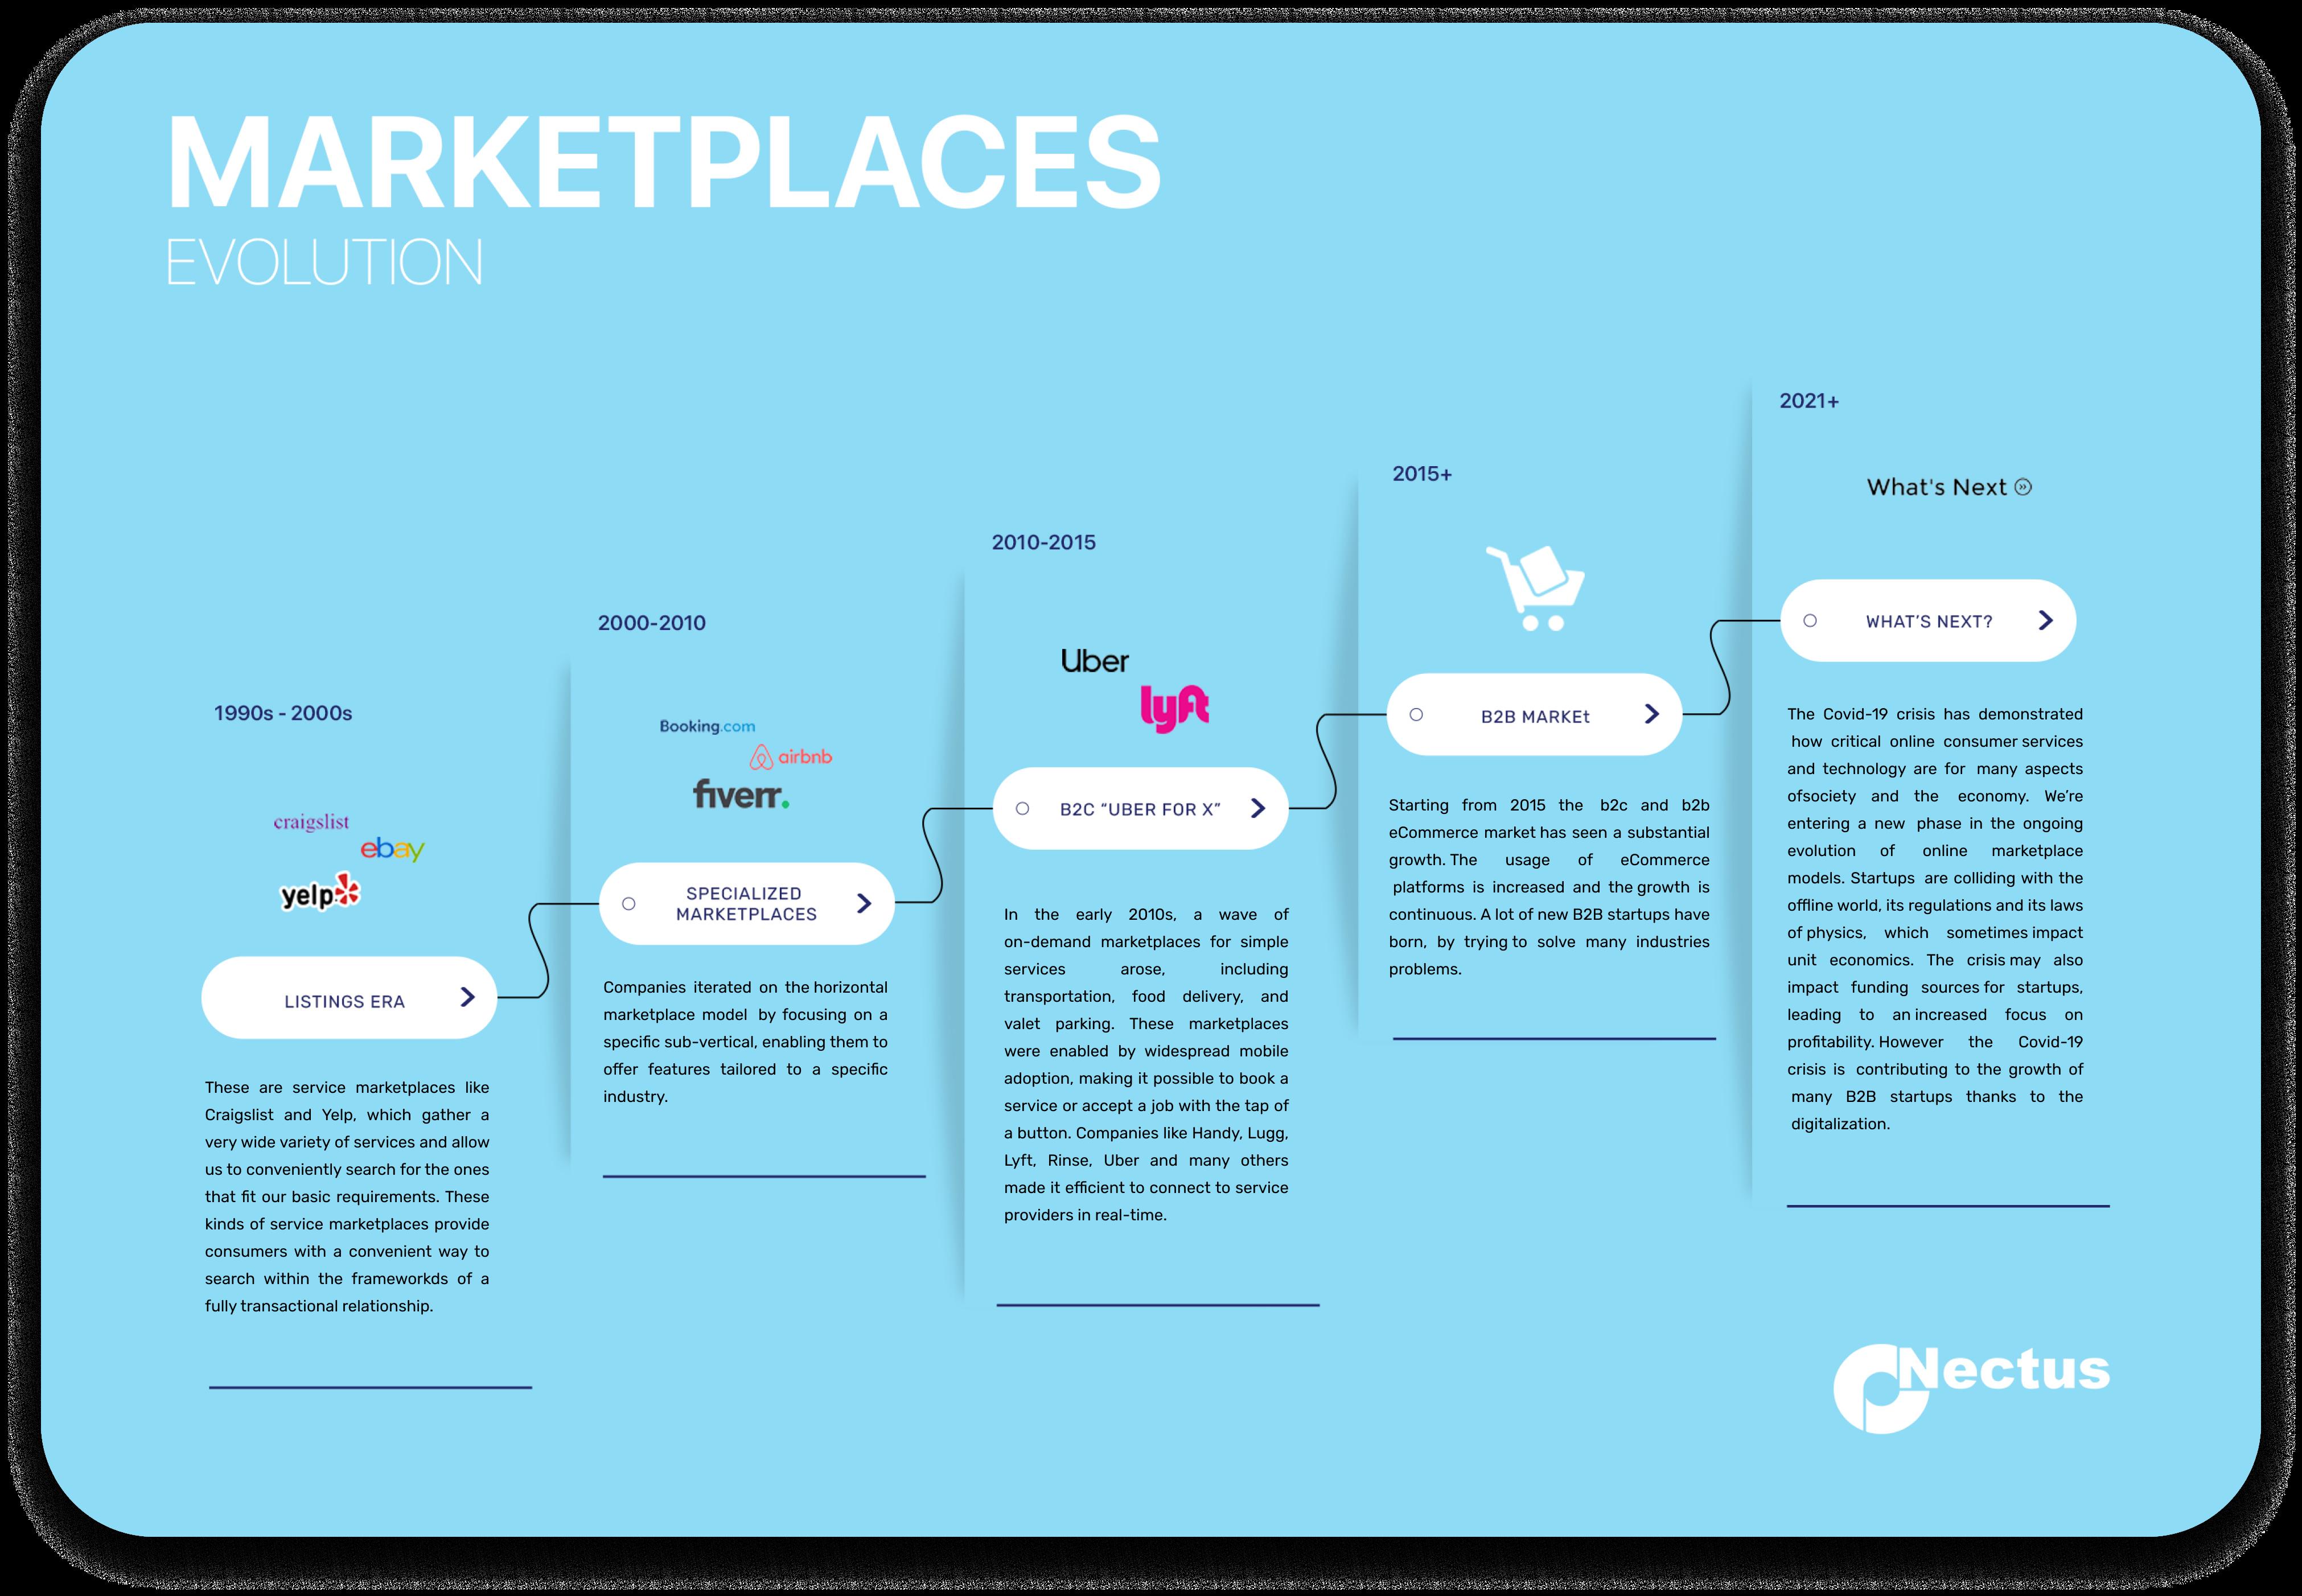 marketplaces evolution development onectus